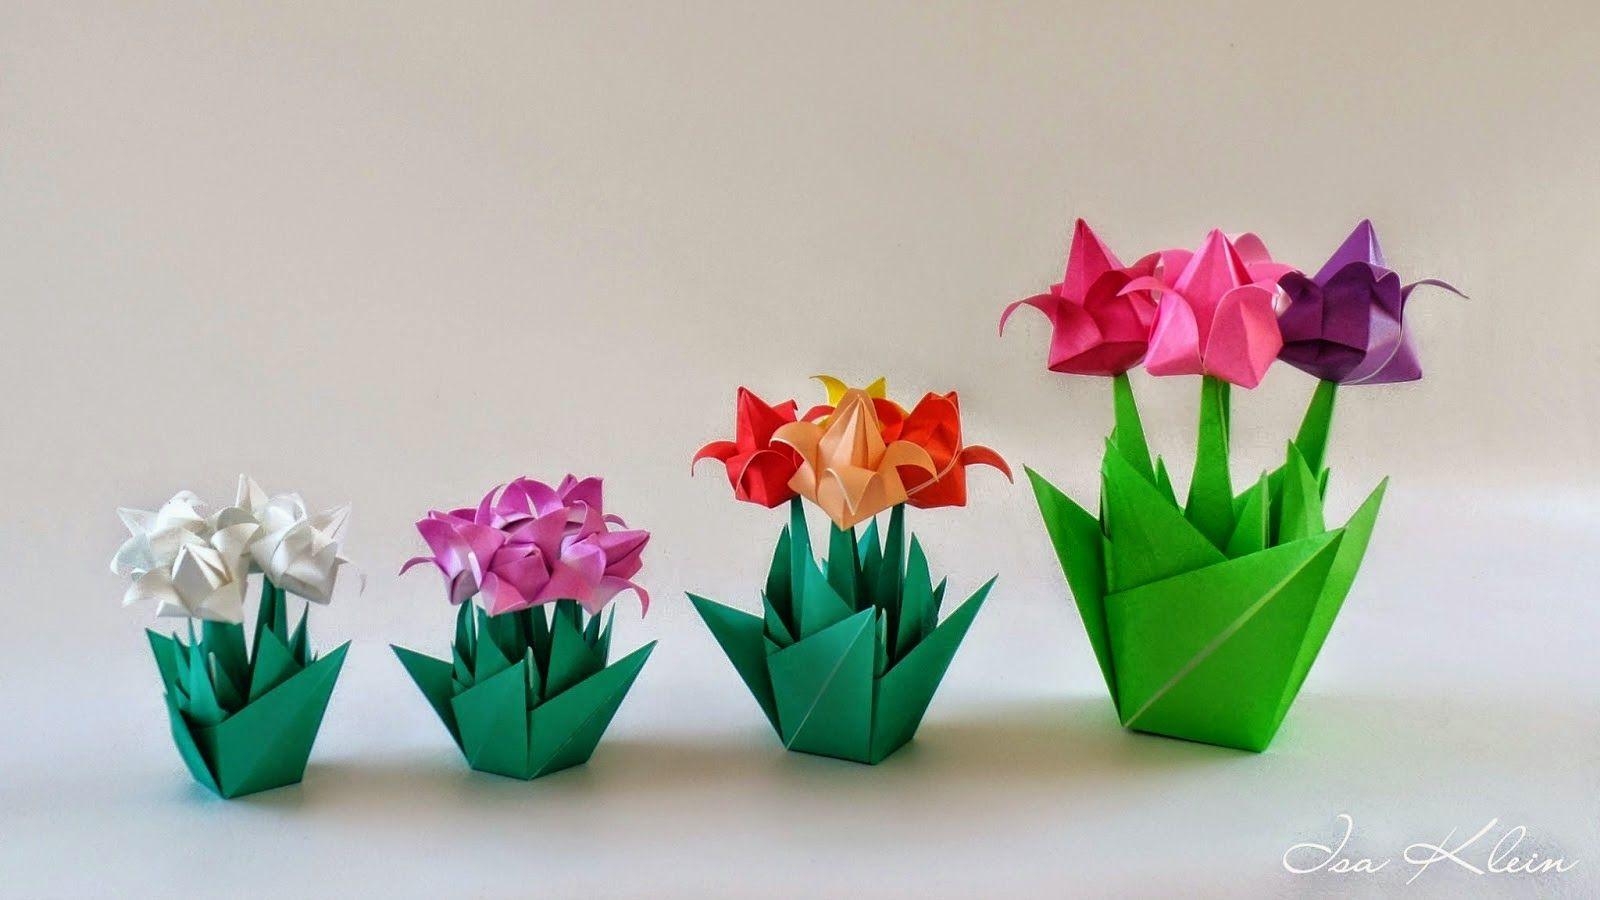 Origami Maniacs Origami Tulip By Isa Klein Origami Pinterest